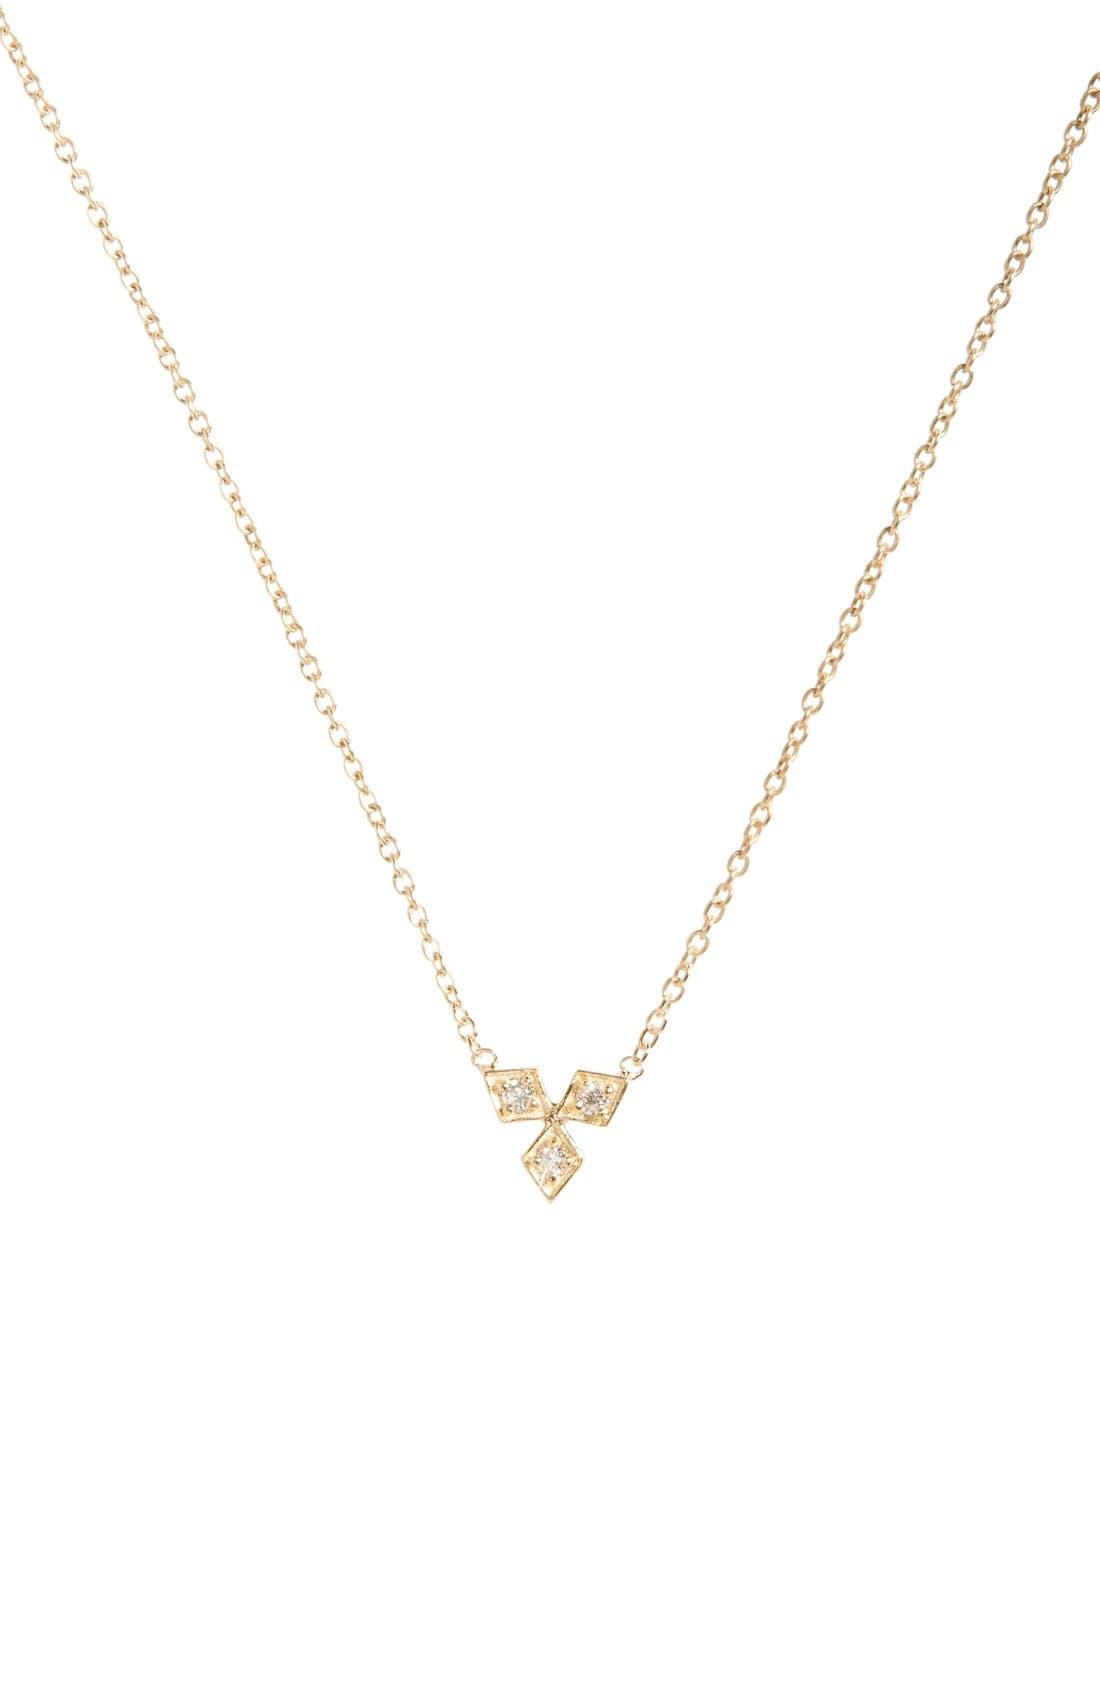 Zoë Chicco Three-Diamond Pendant Necklace